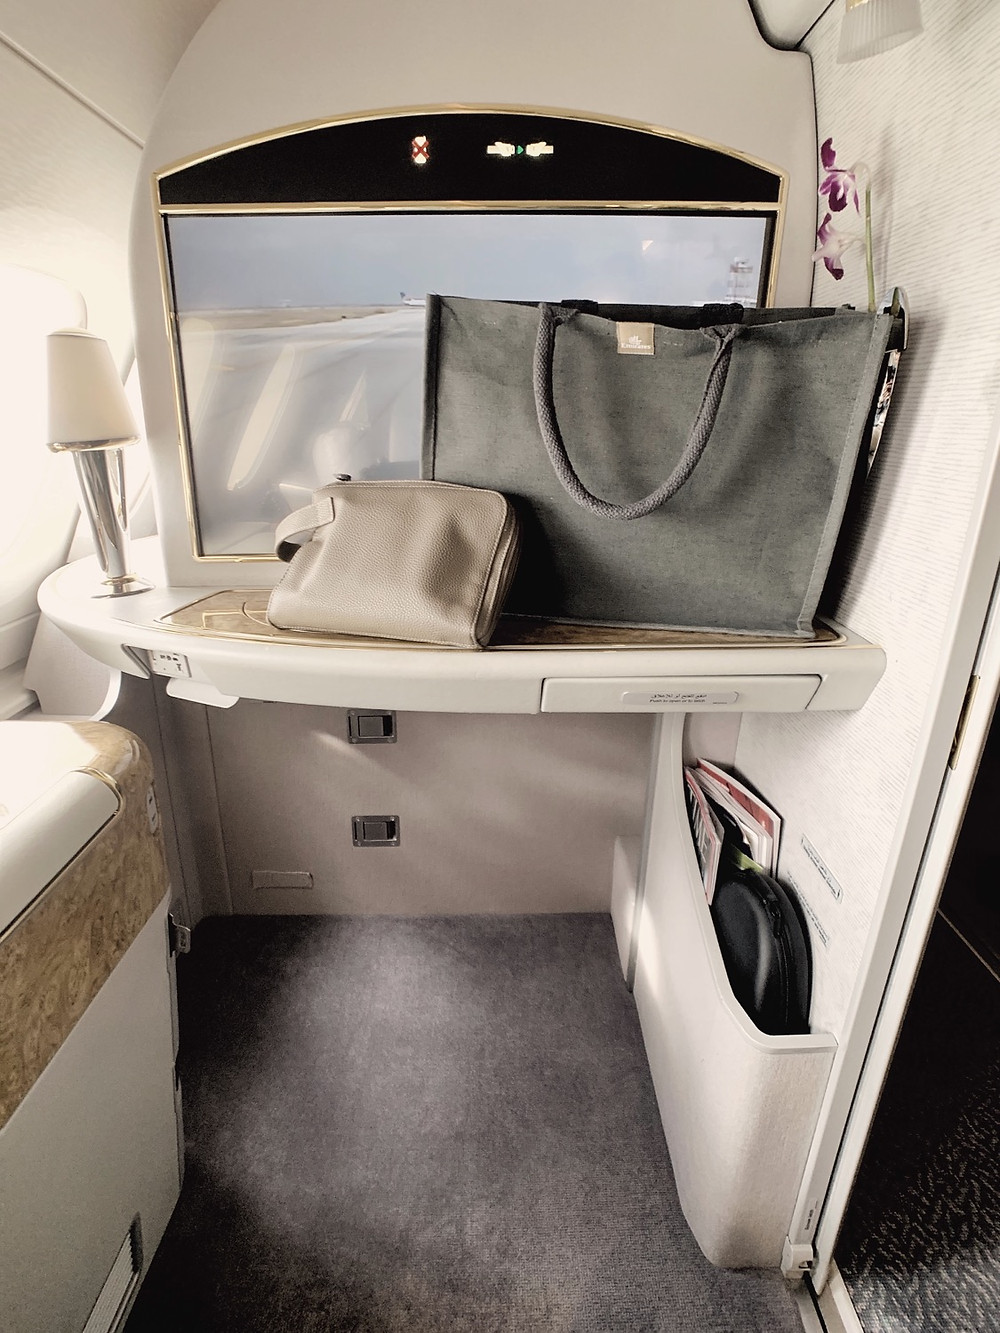 Emirates First Class San Francisco - Dubai, Amenity Kit & Pajamas